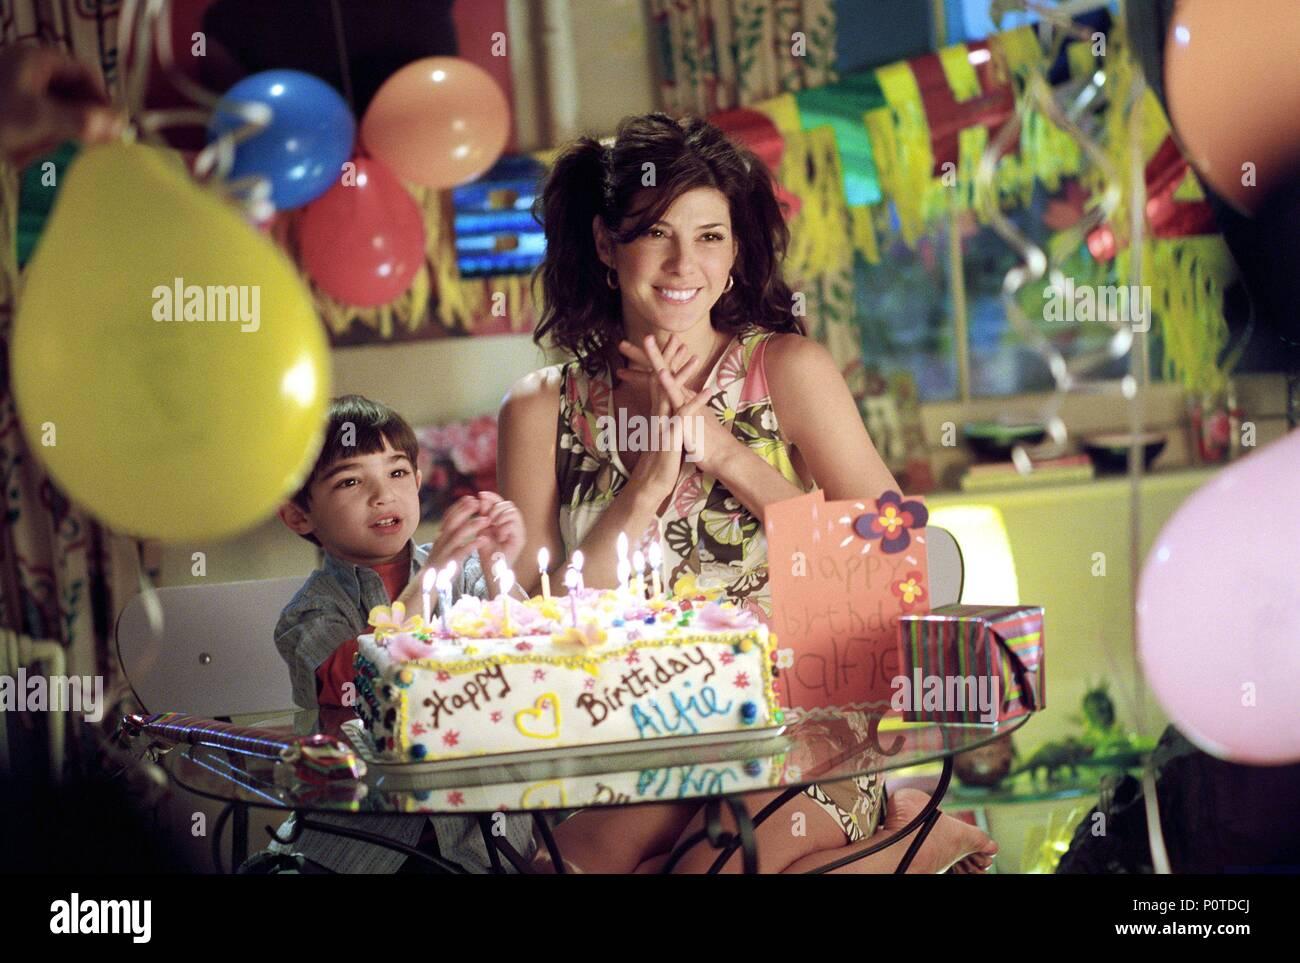 Original Film Title: ALFIE.  English Title: ALFIE.  Film Director: CHARLES SHYER.  Year: 2004.  Stars: MARISA TOMEI. Credit: PARAMOUNT PICTURES / Album - Stock Image